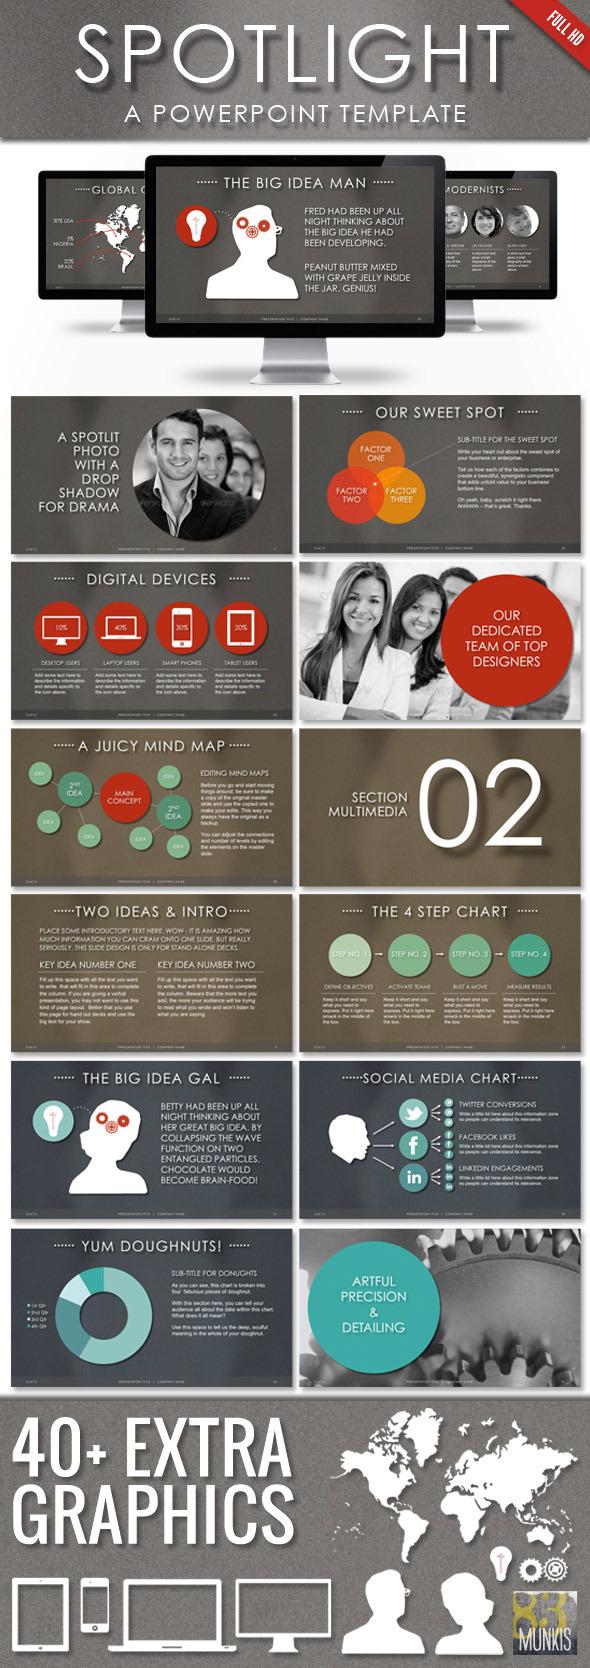 Spotlight Powerpoint Template - Business PowerPoint Templates